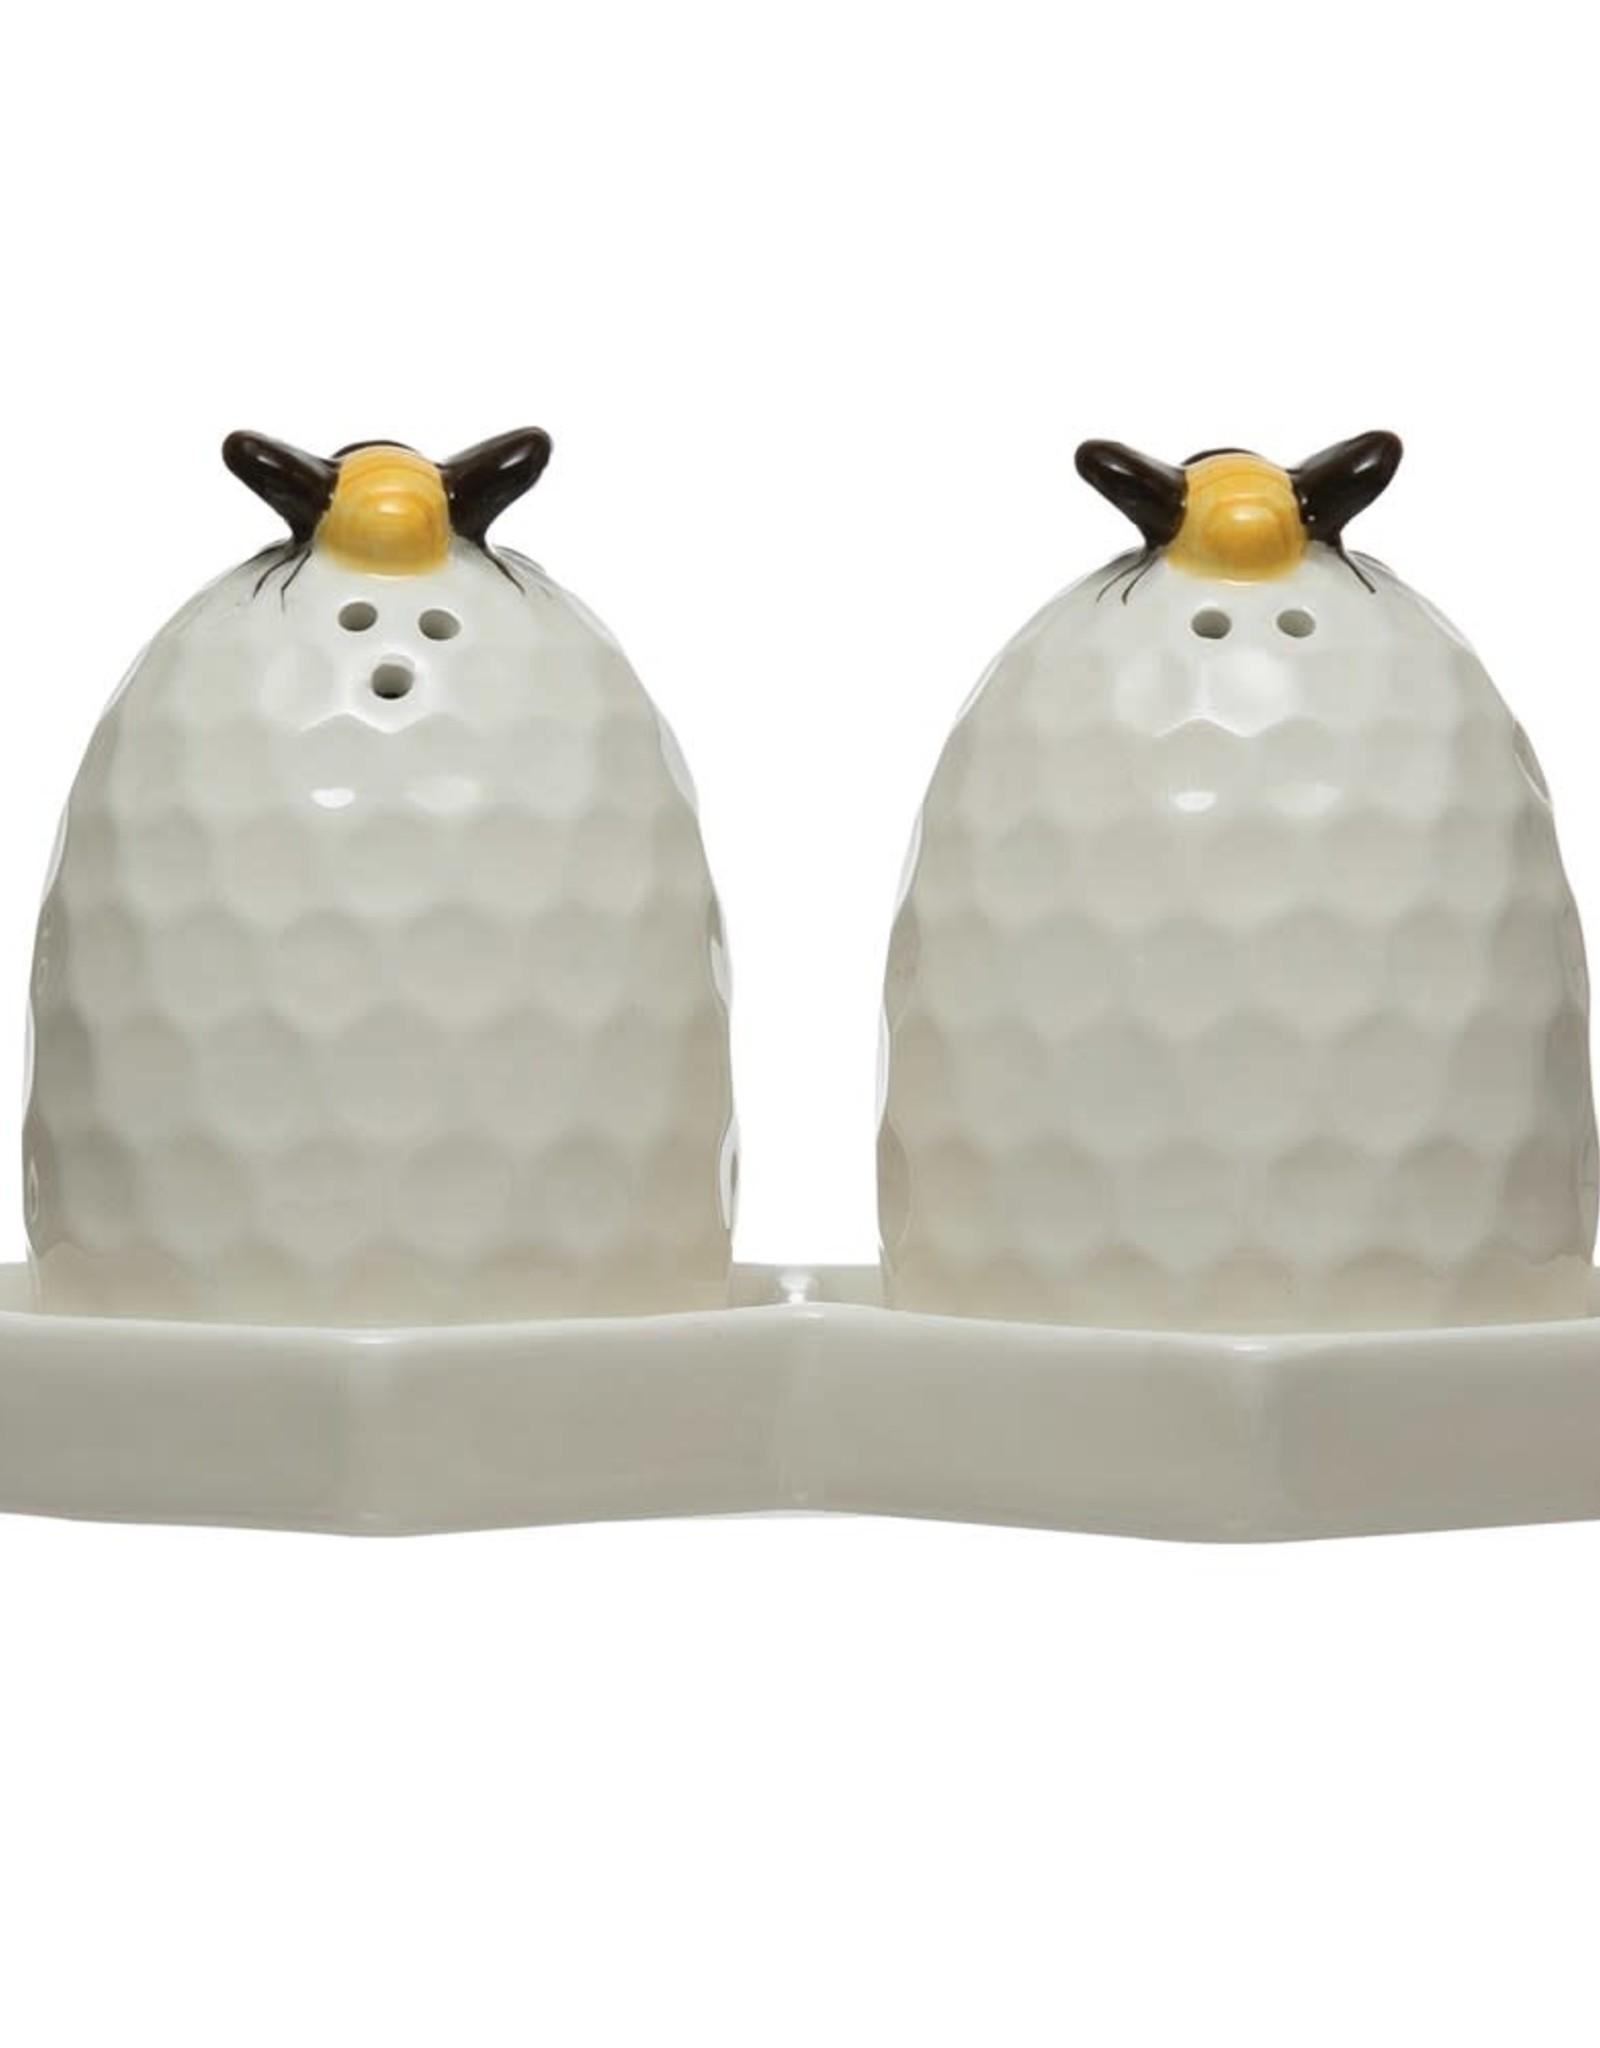 Wink Honeycomb Salt and Pepper Shaker Set